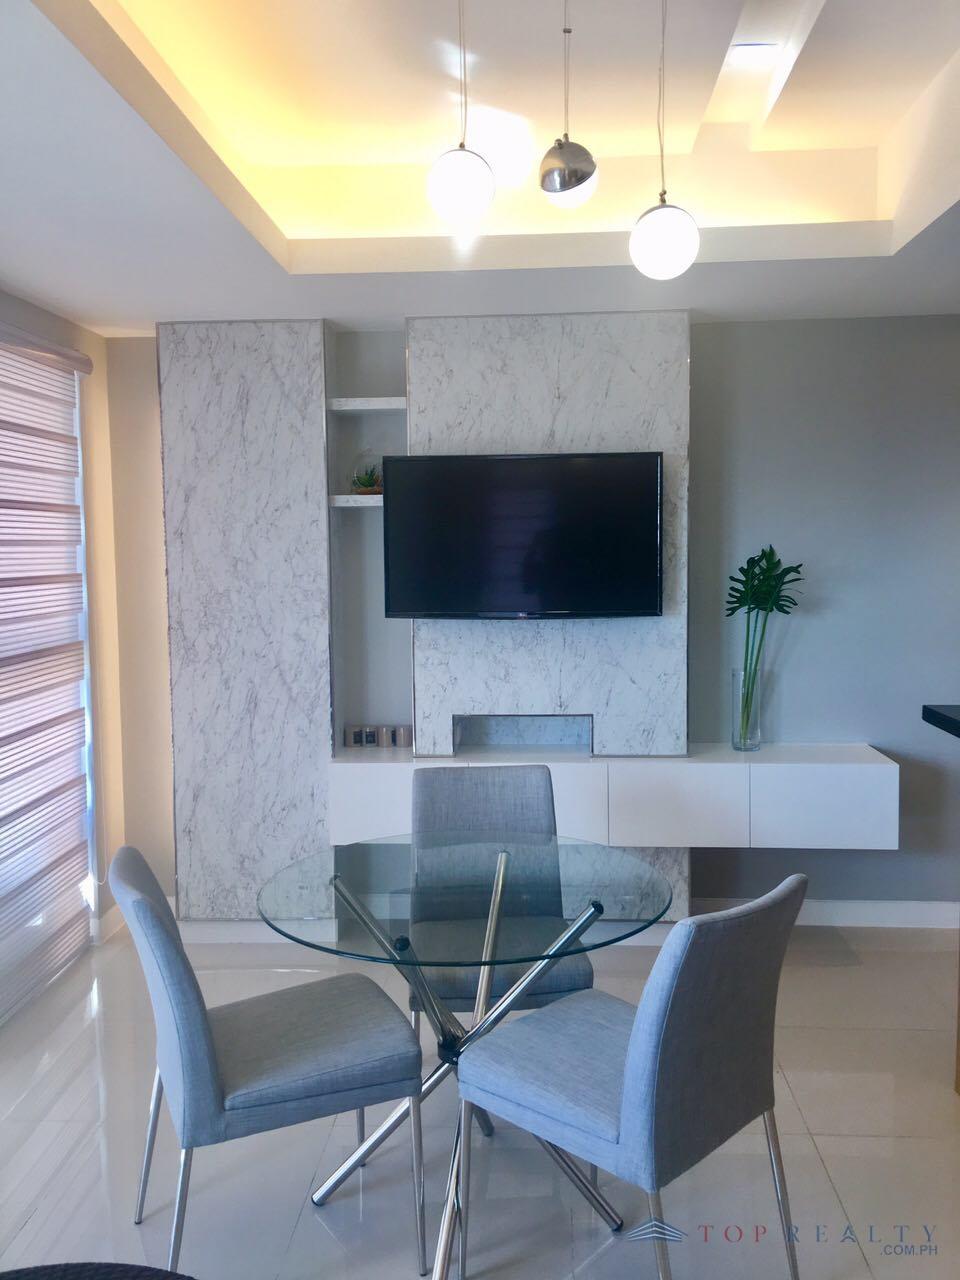 DR88029- Big 1 Bedroom Interior